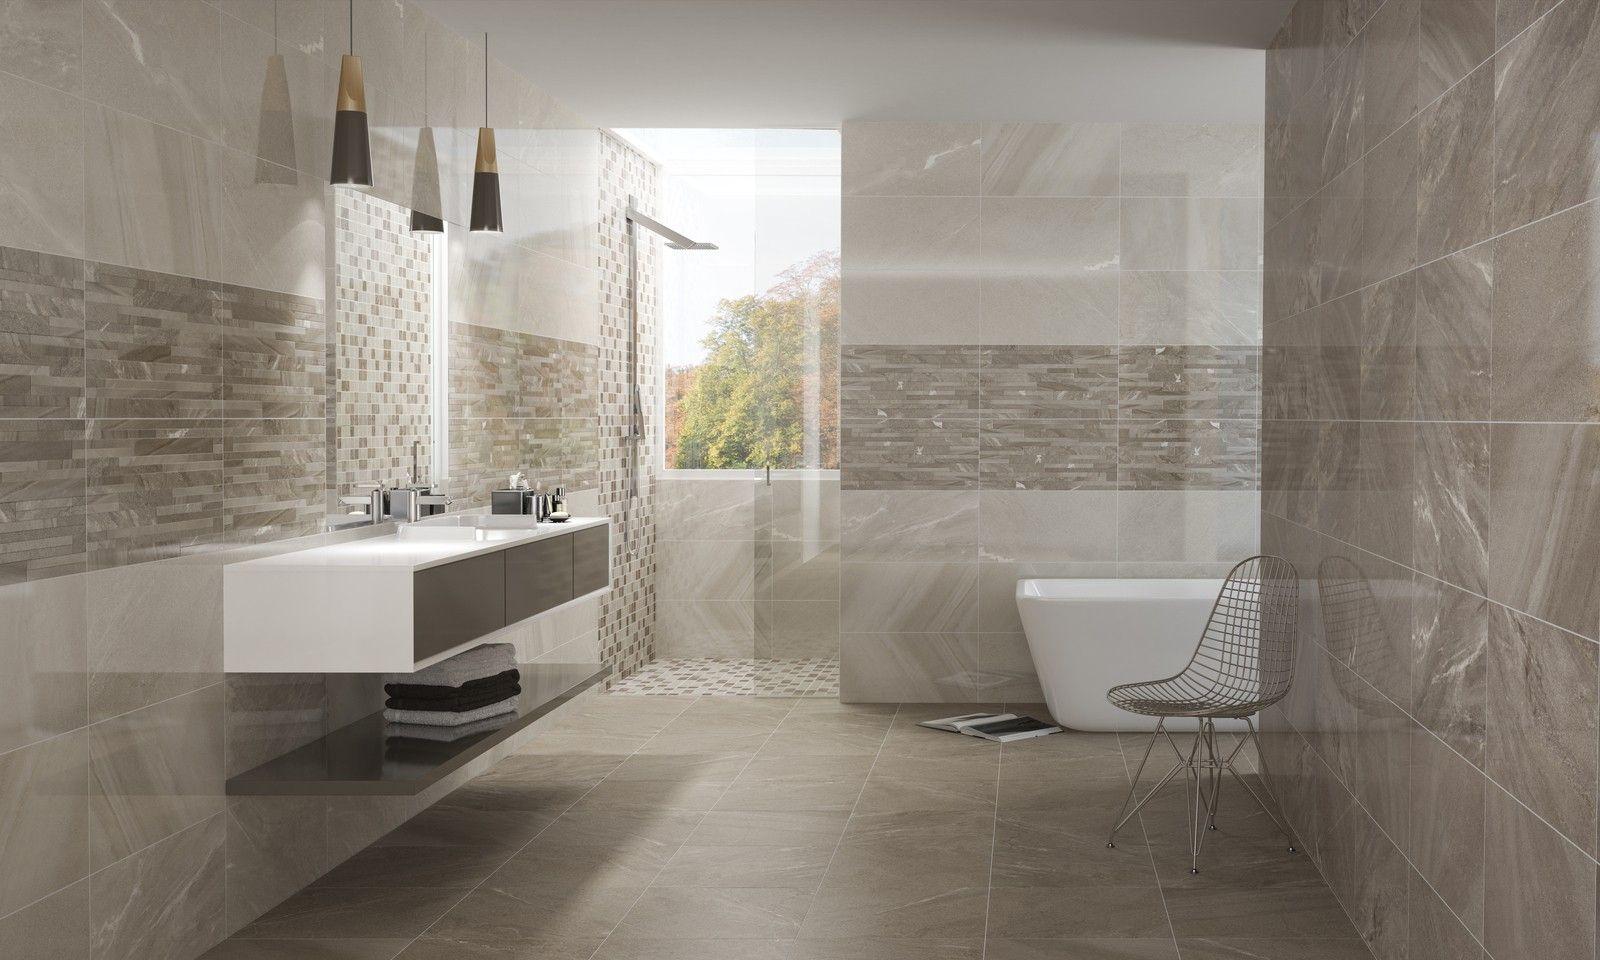 Bathroom Floor Tile Design Home Design Ideas Floor Tile Design